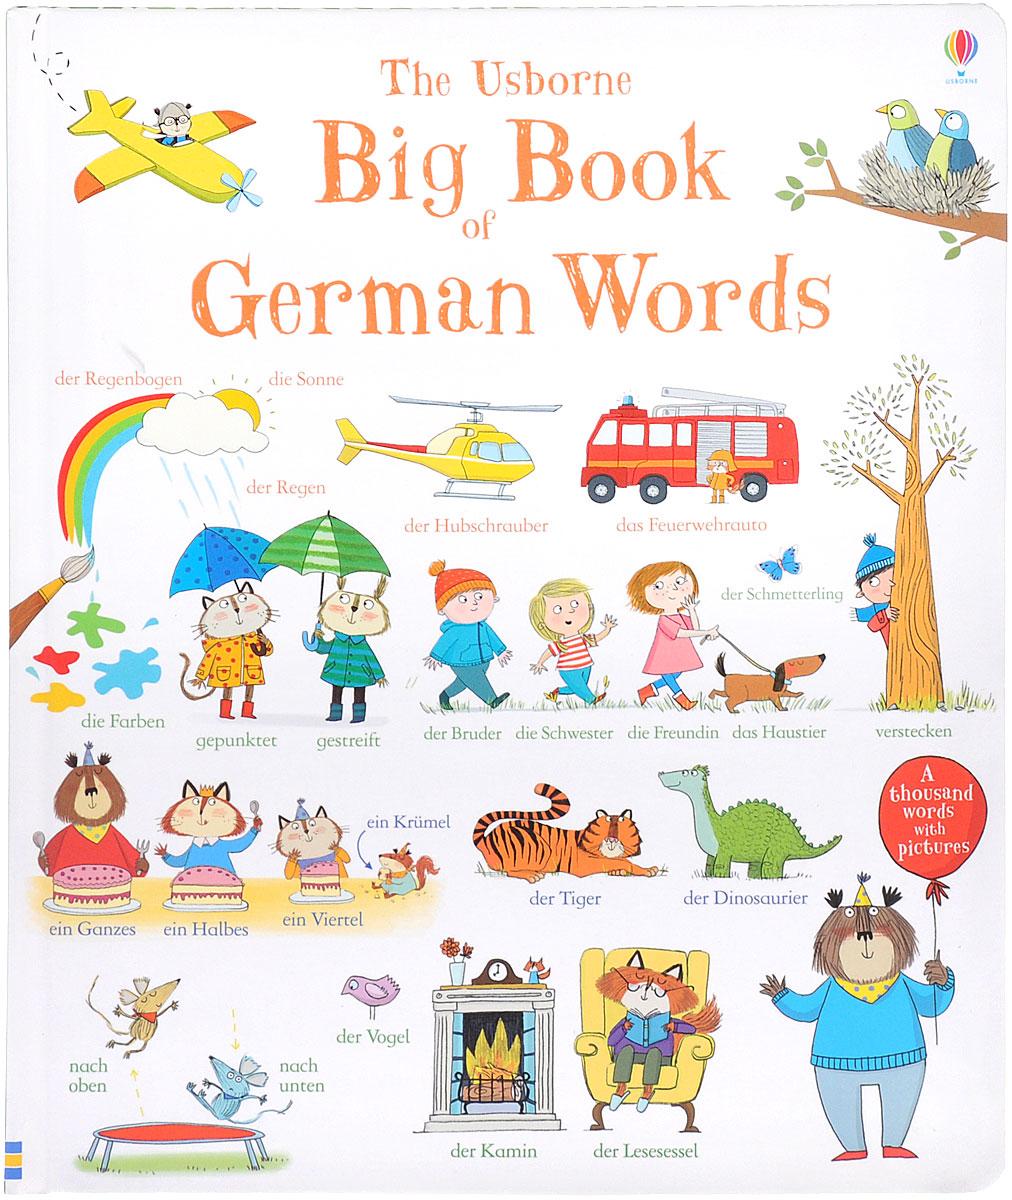 The Usborne Big Book of German Words al ko 32см 112725